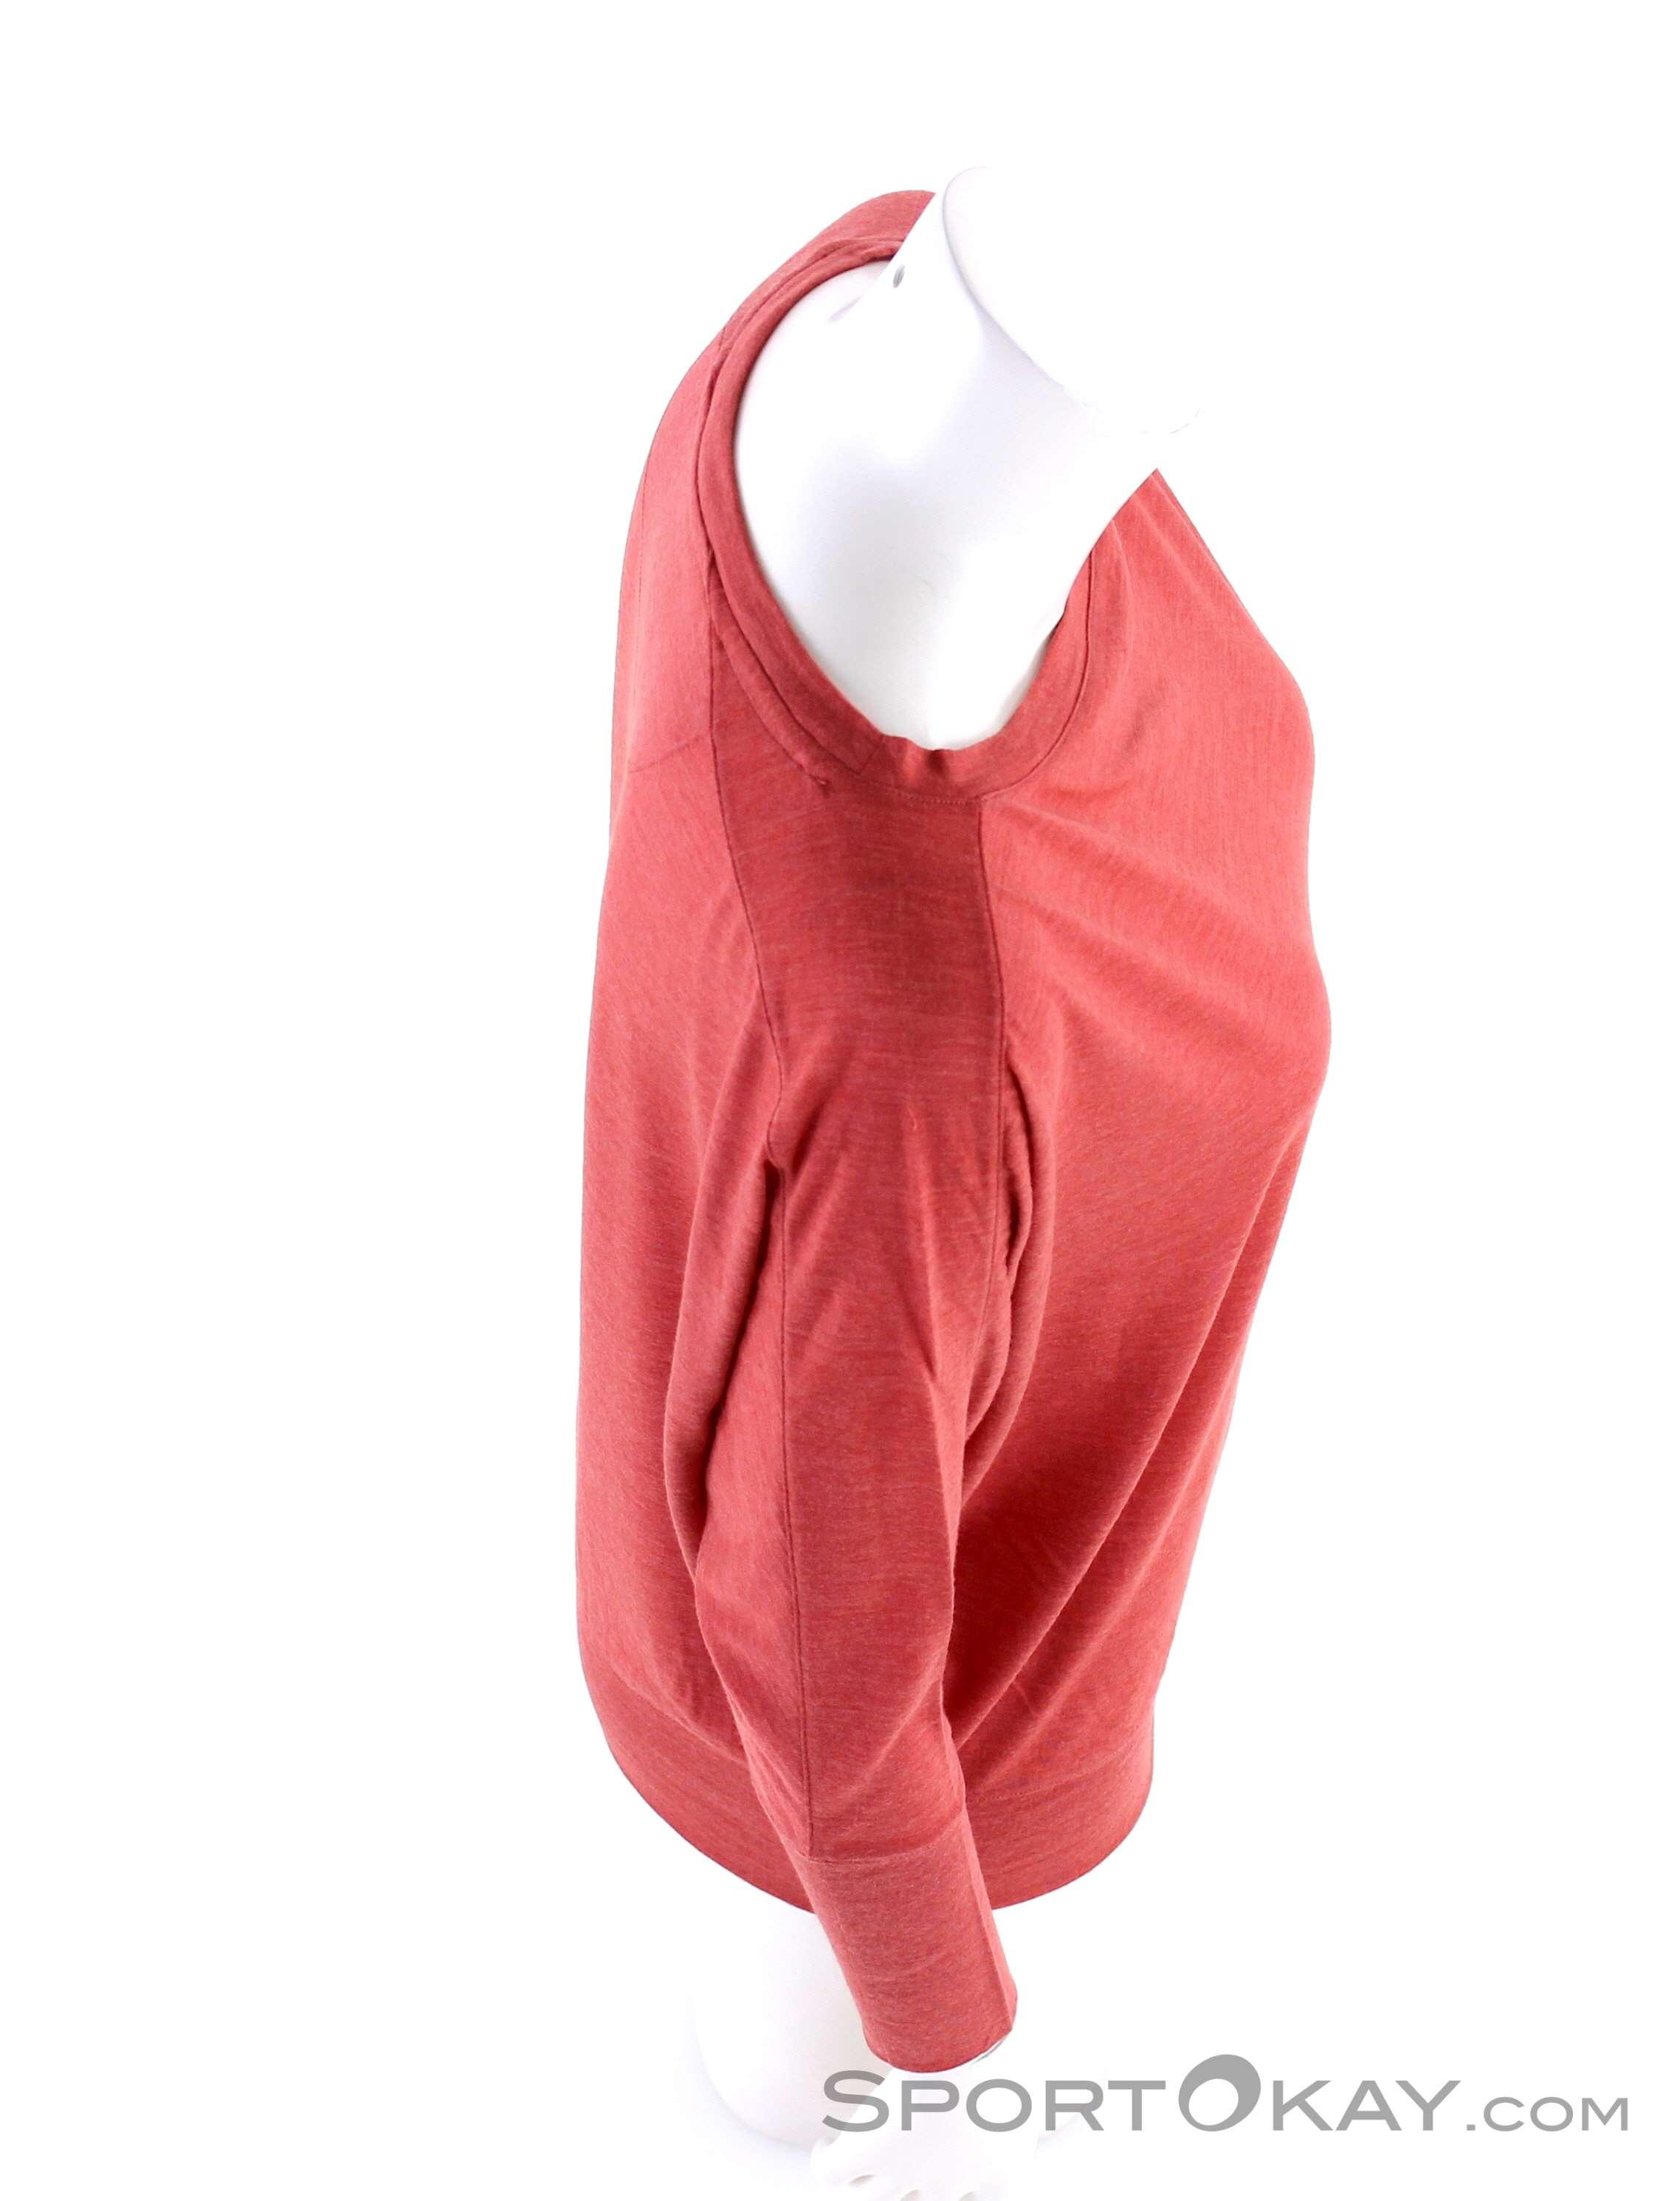 super.natural Damen W Kula Merino Yoga-Und Fitness-top